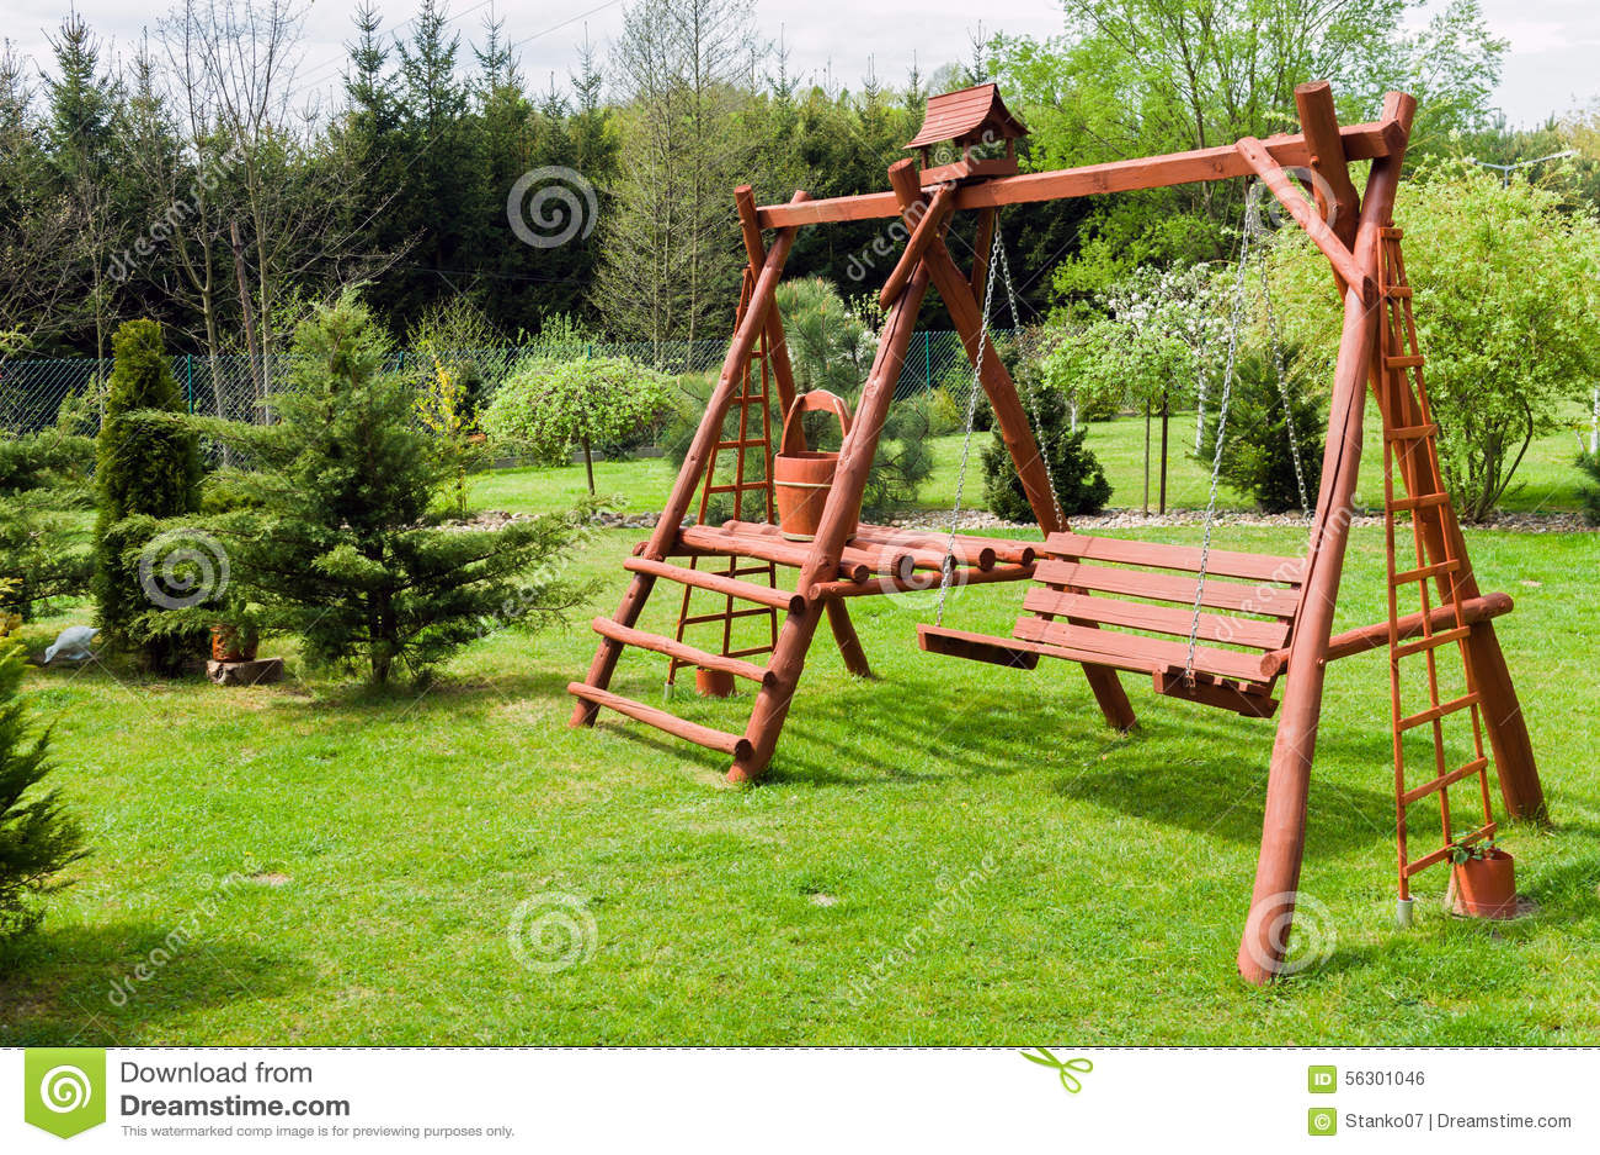 Wooden Garden Swing. Wooden Homemade Garden Architecture Royalty Free Stock  Image